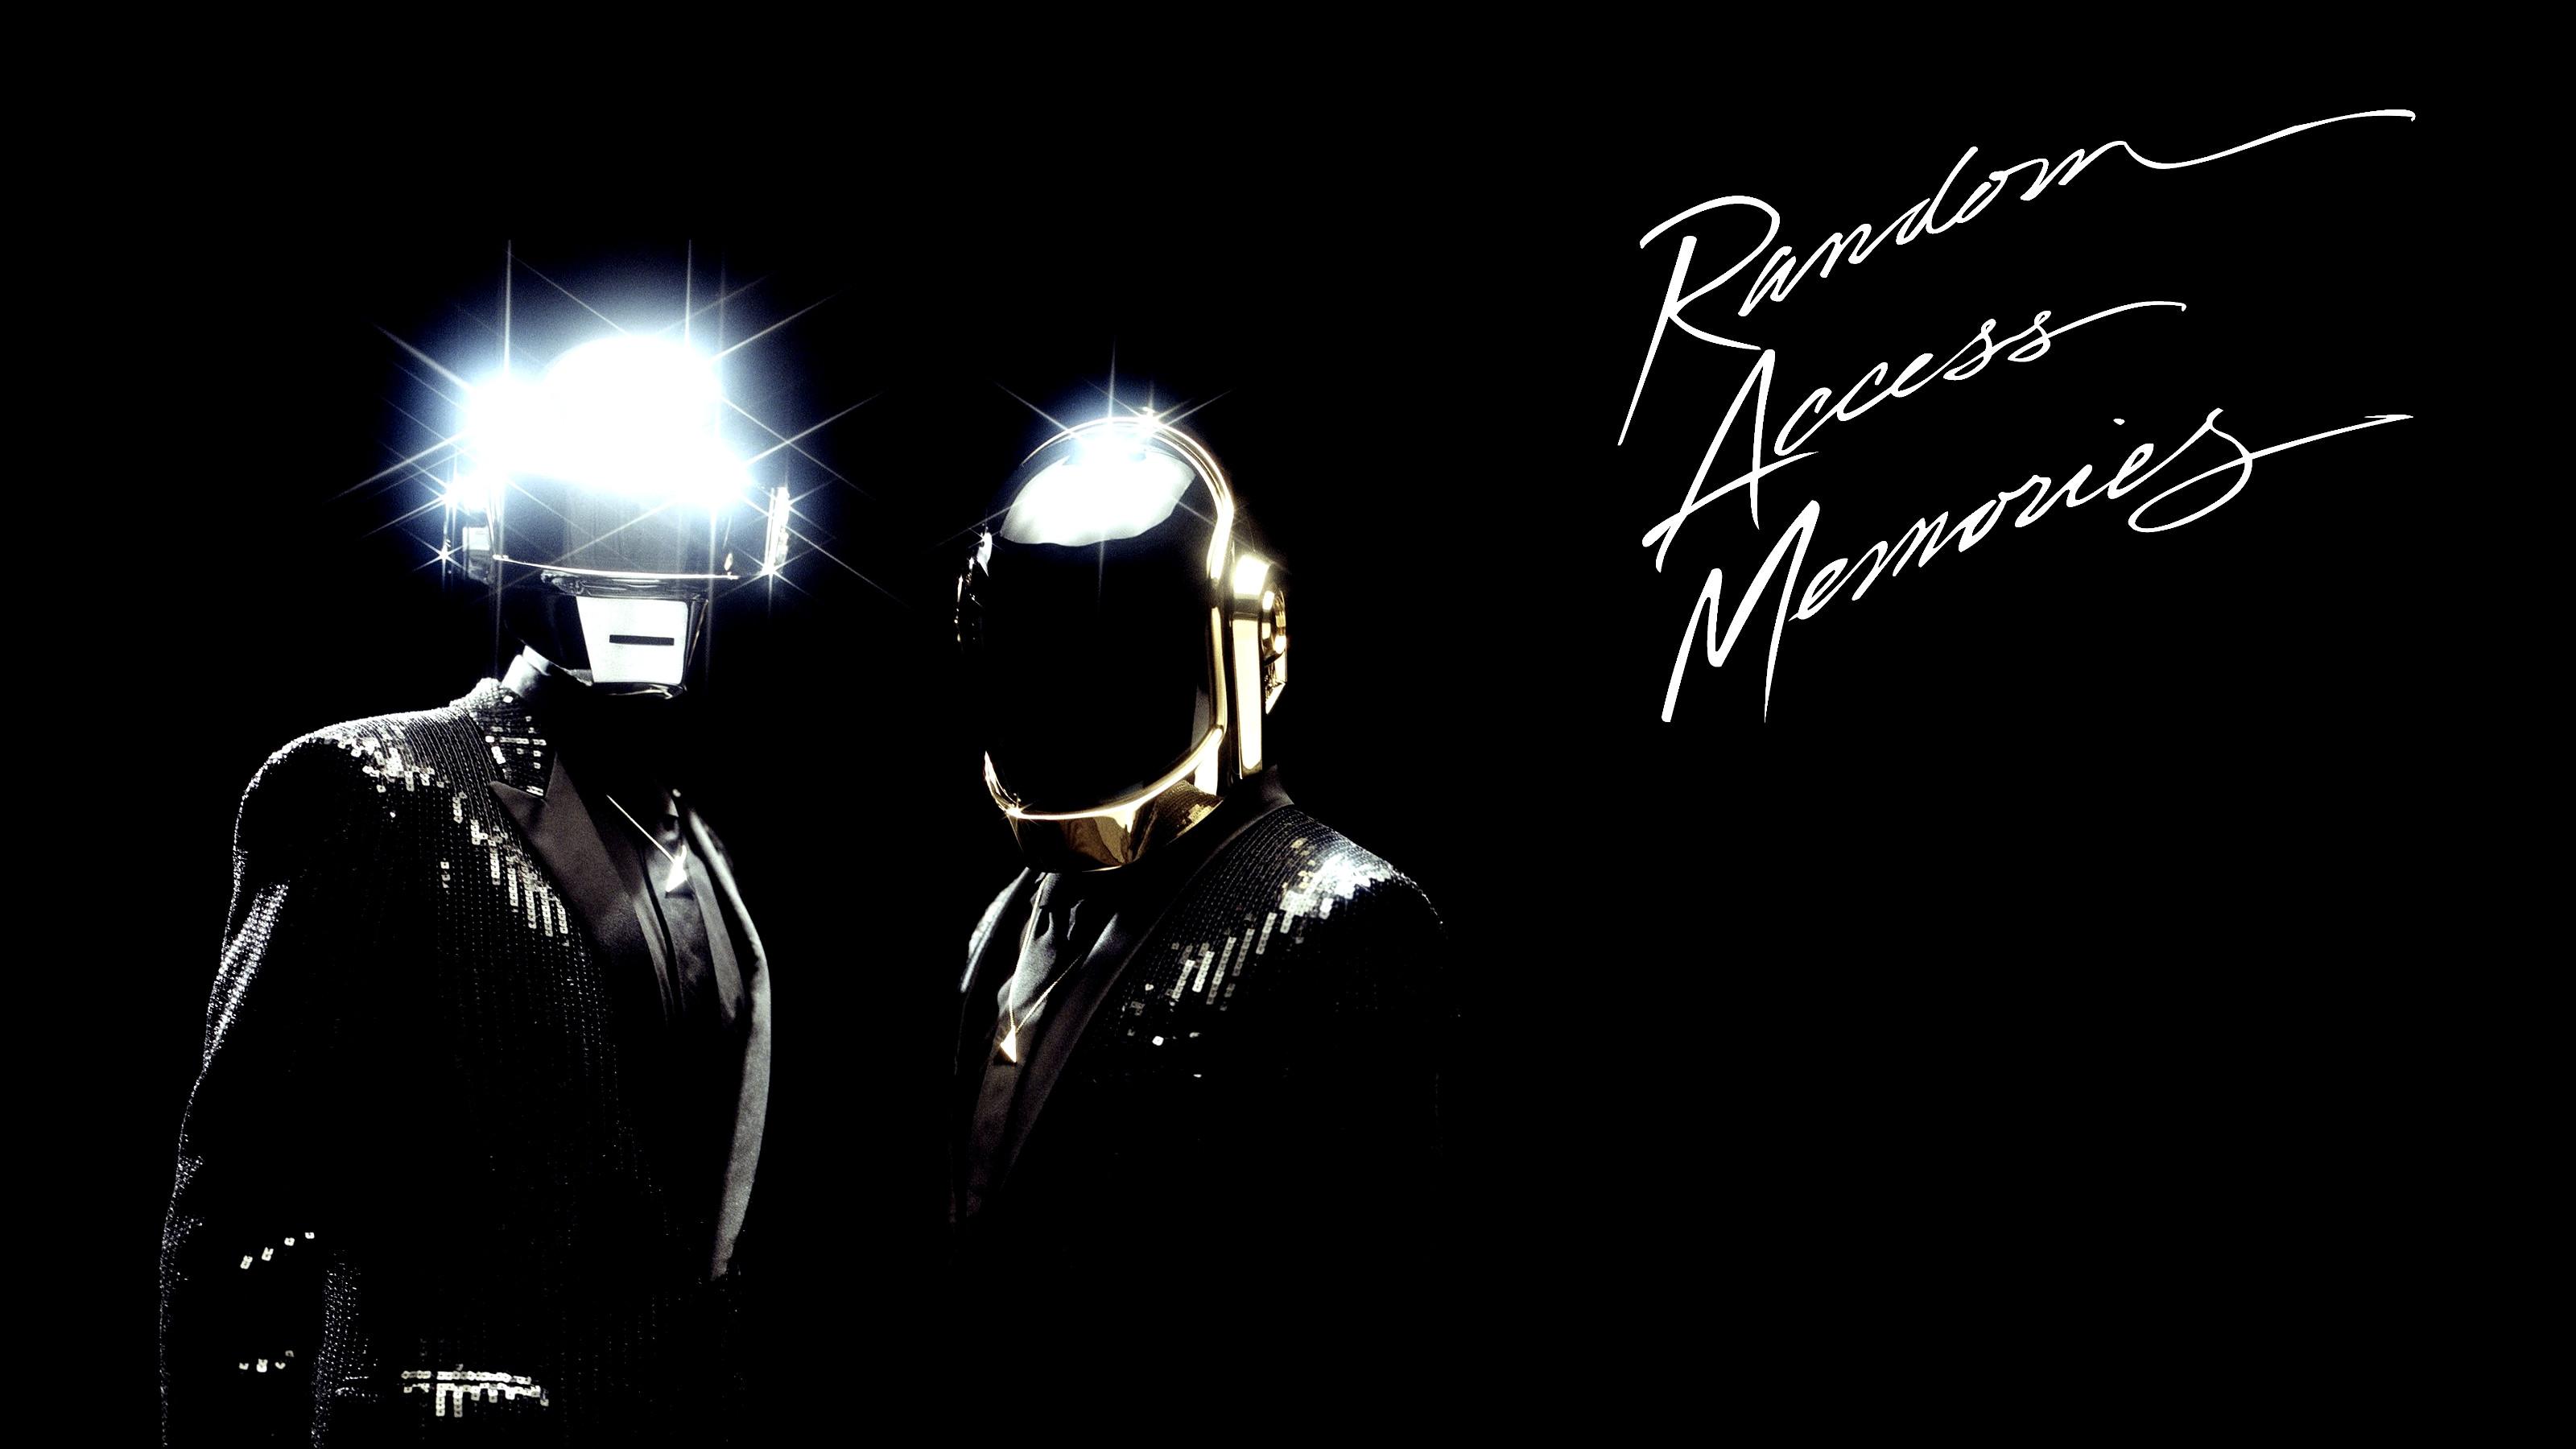 MegaPost  Daft Punk Discografia     kbps  Mega    Identi Reddit Daft Punk   Discografia oficial